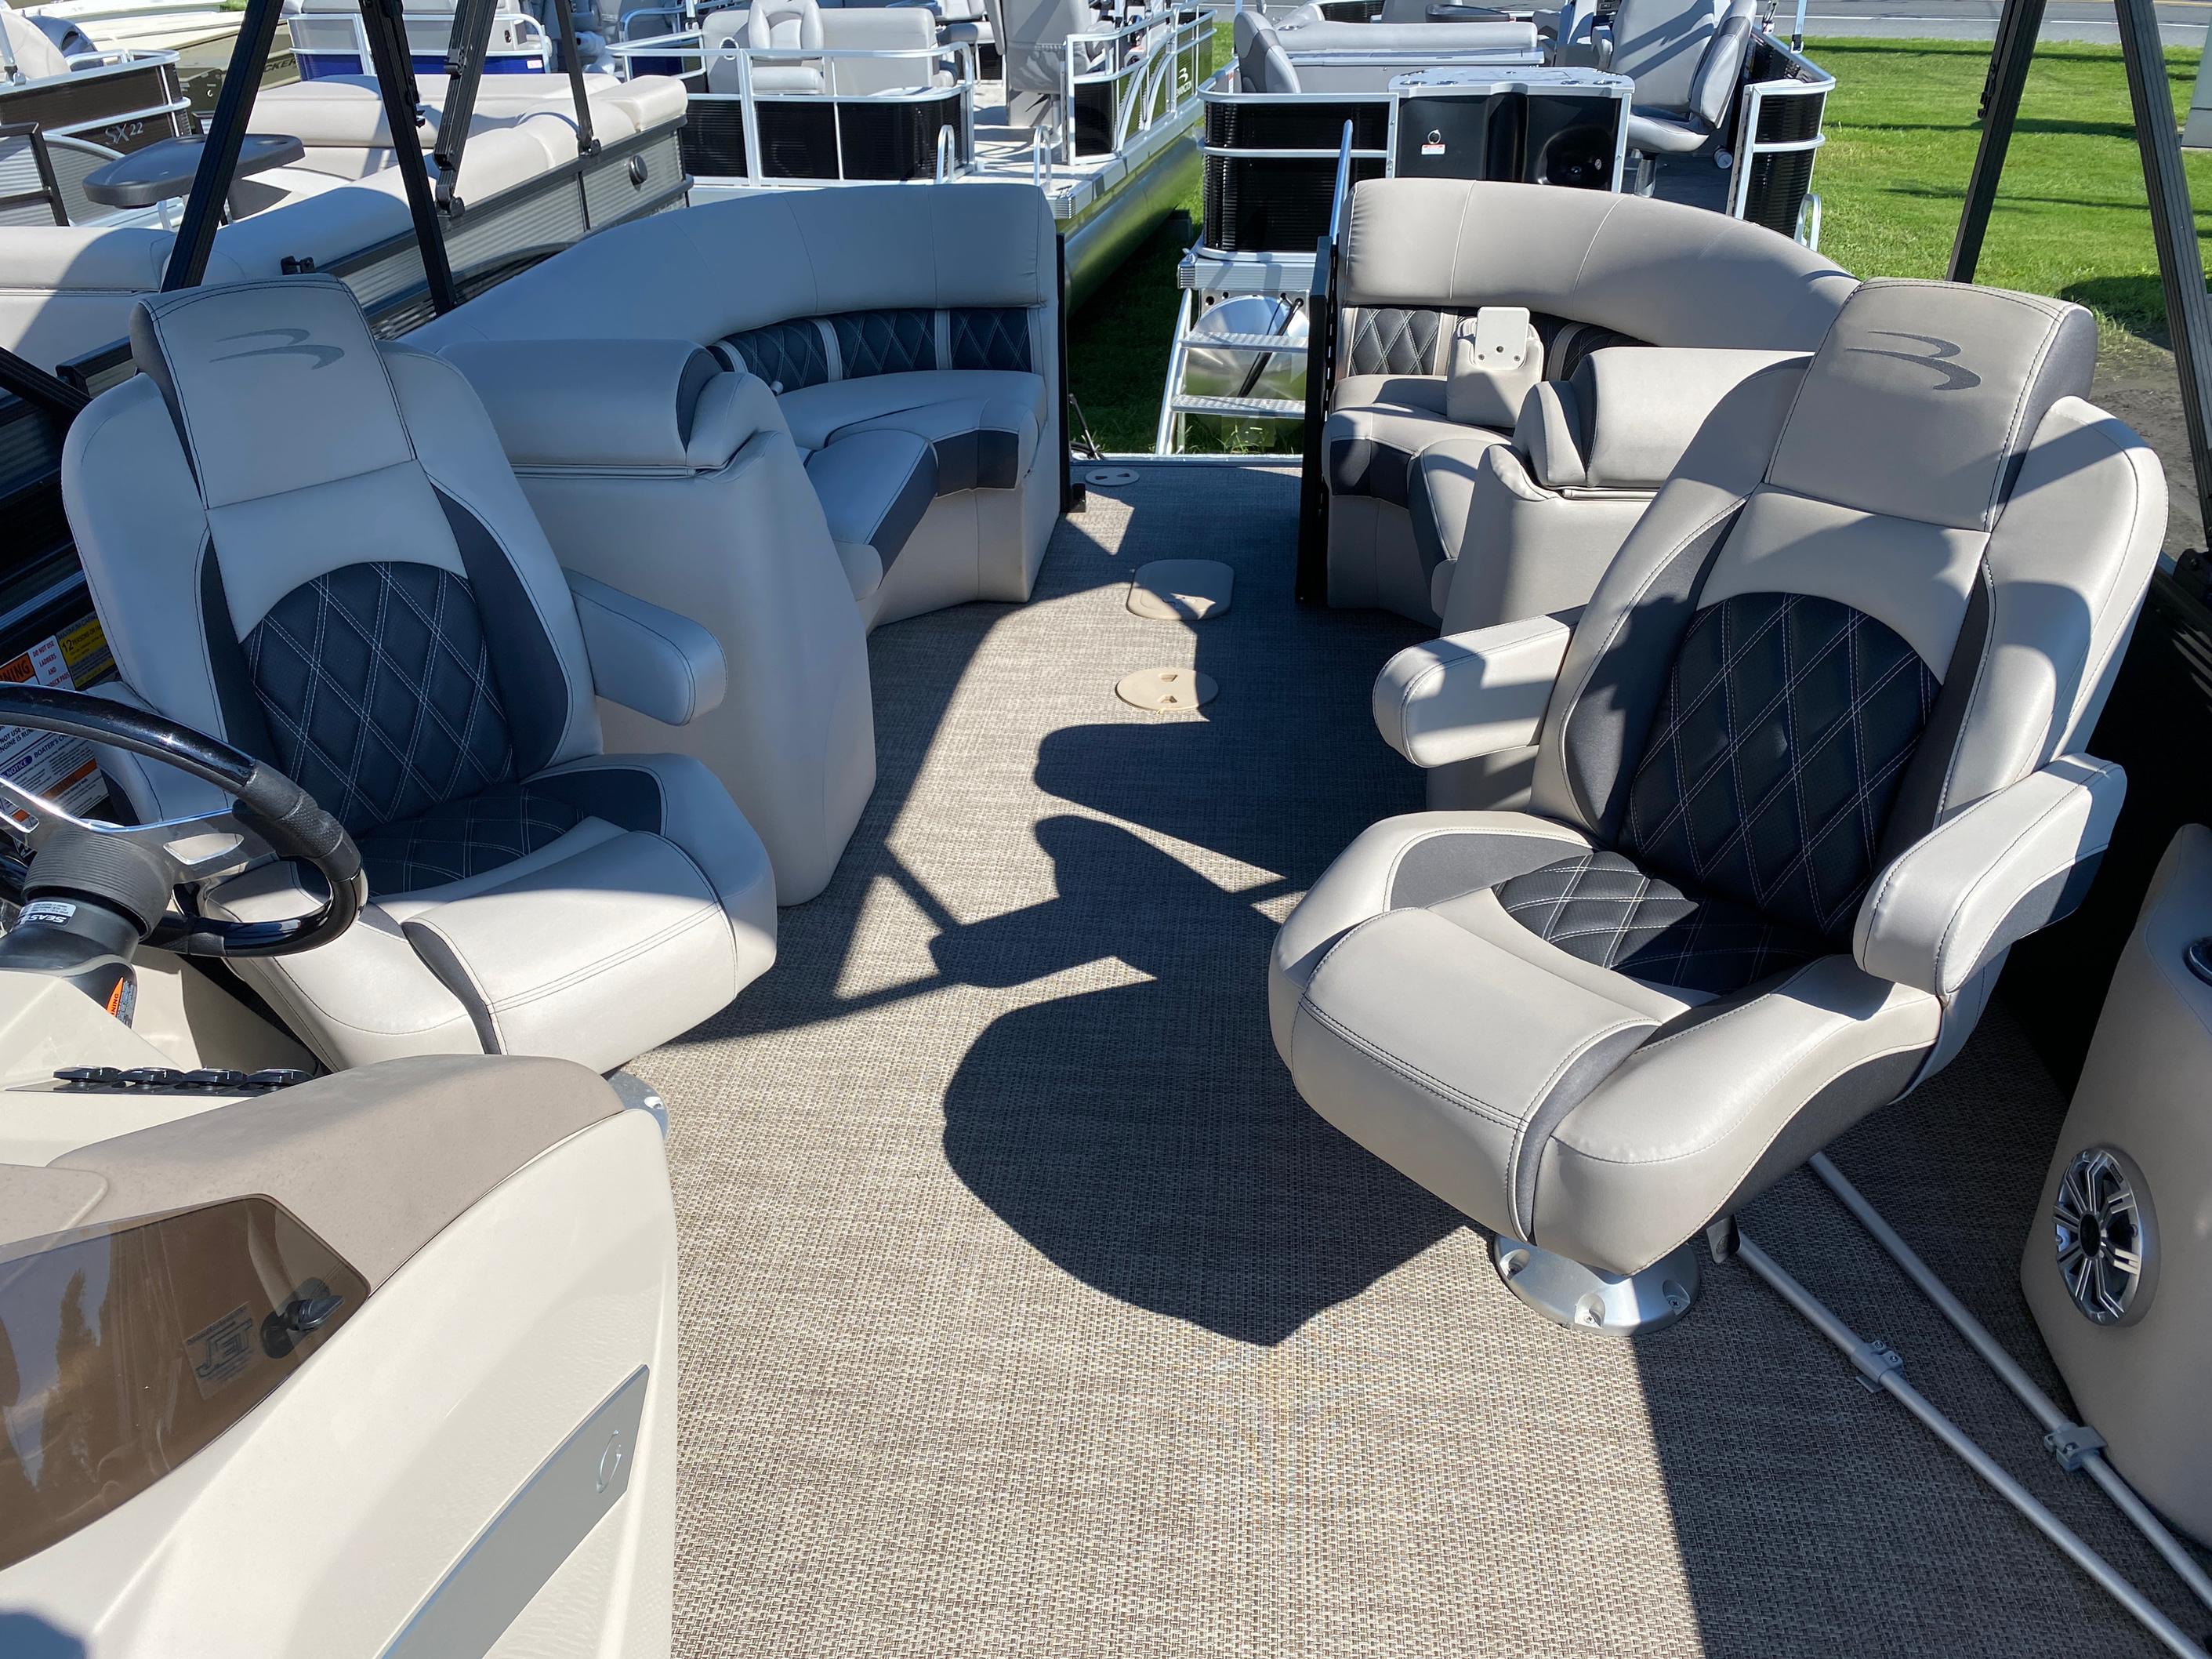 2019 Bennington boat for sale, model of the boat is 23 GSR & Image # 8 of 10